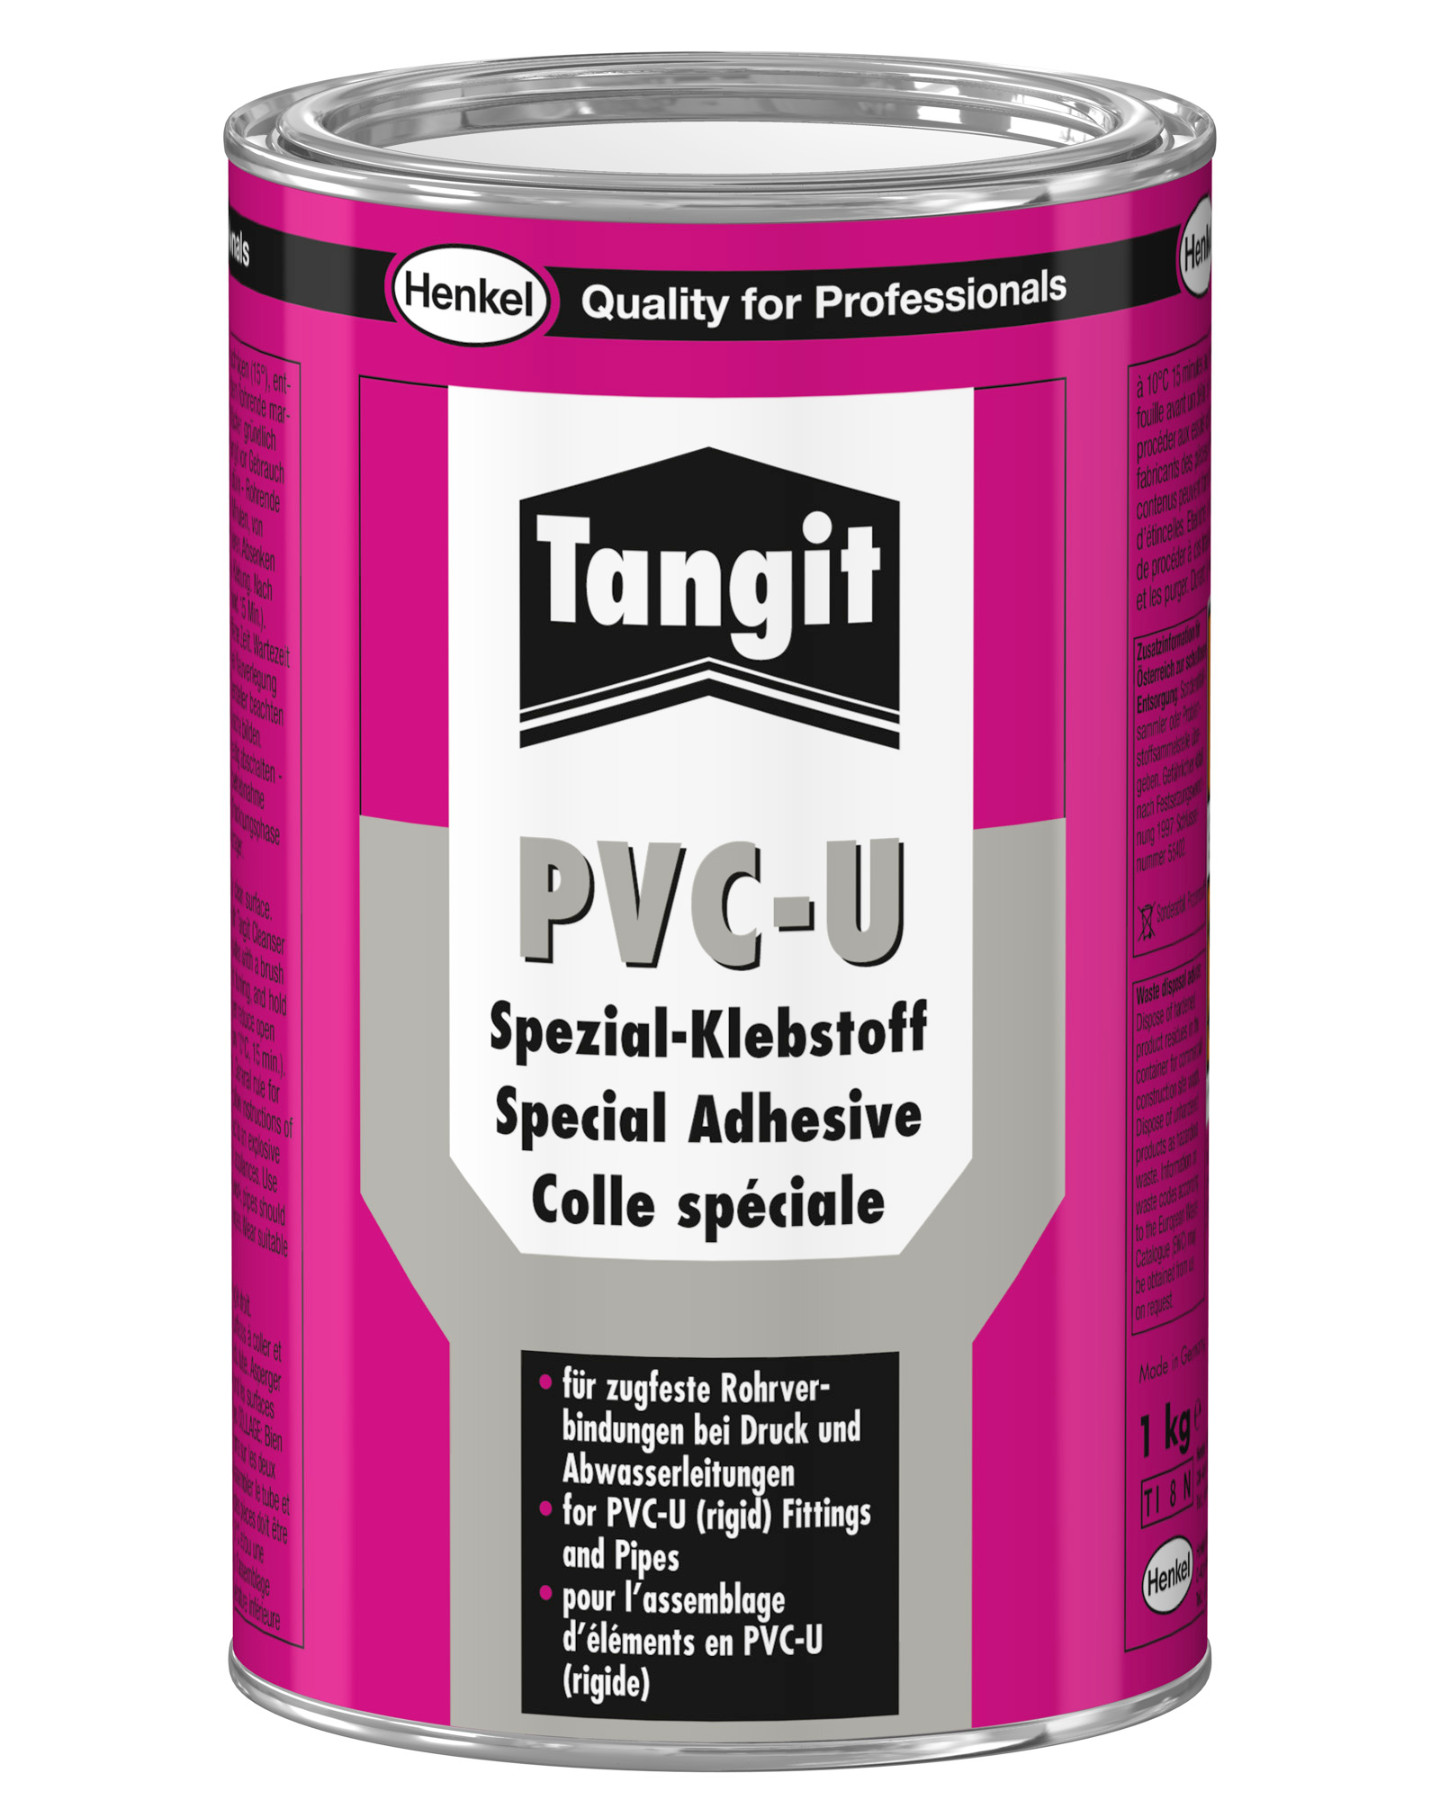 Tangit PVC-U Klebstoff 250g Dose